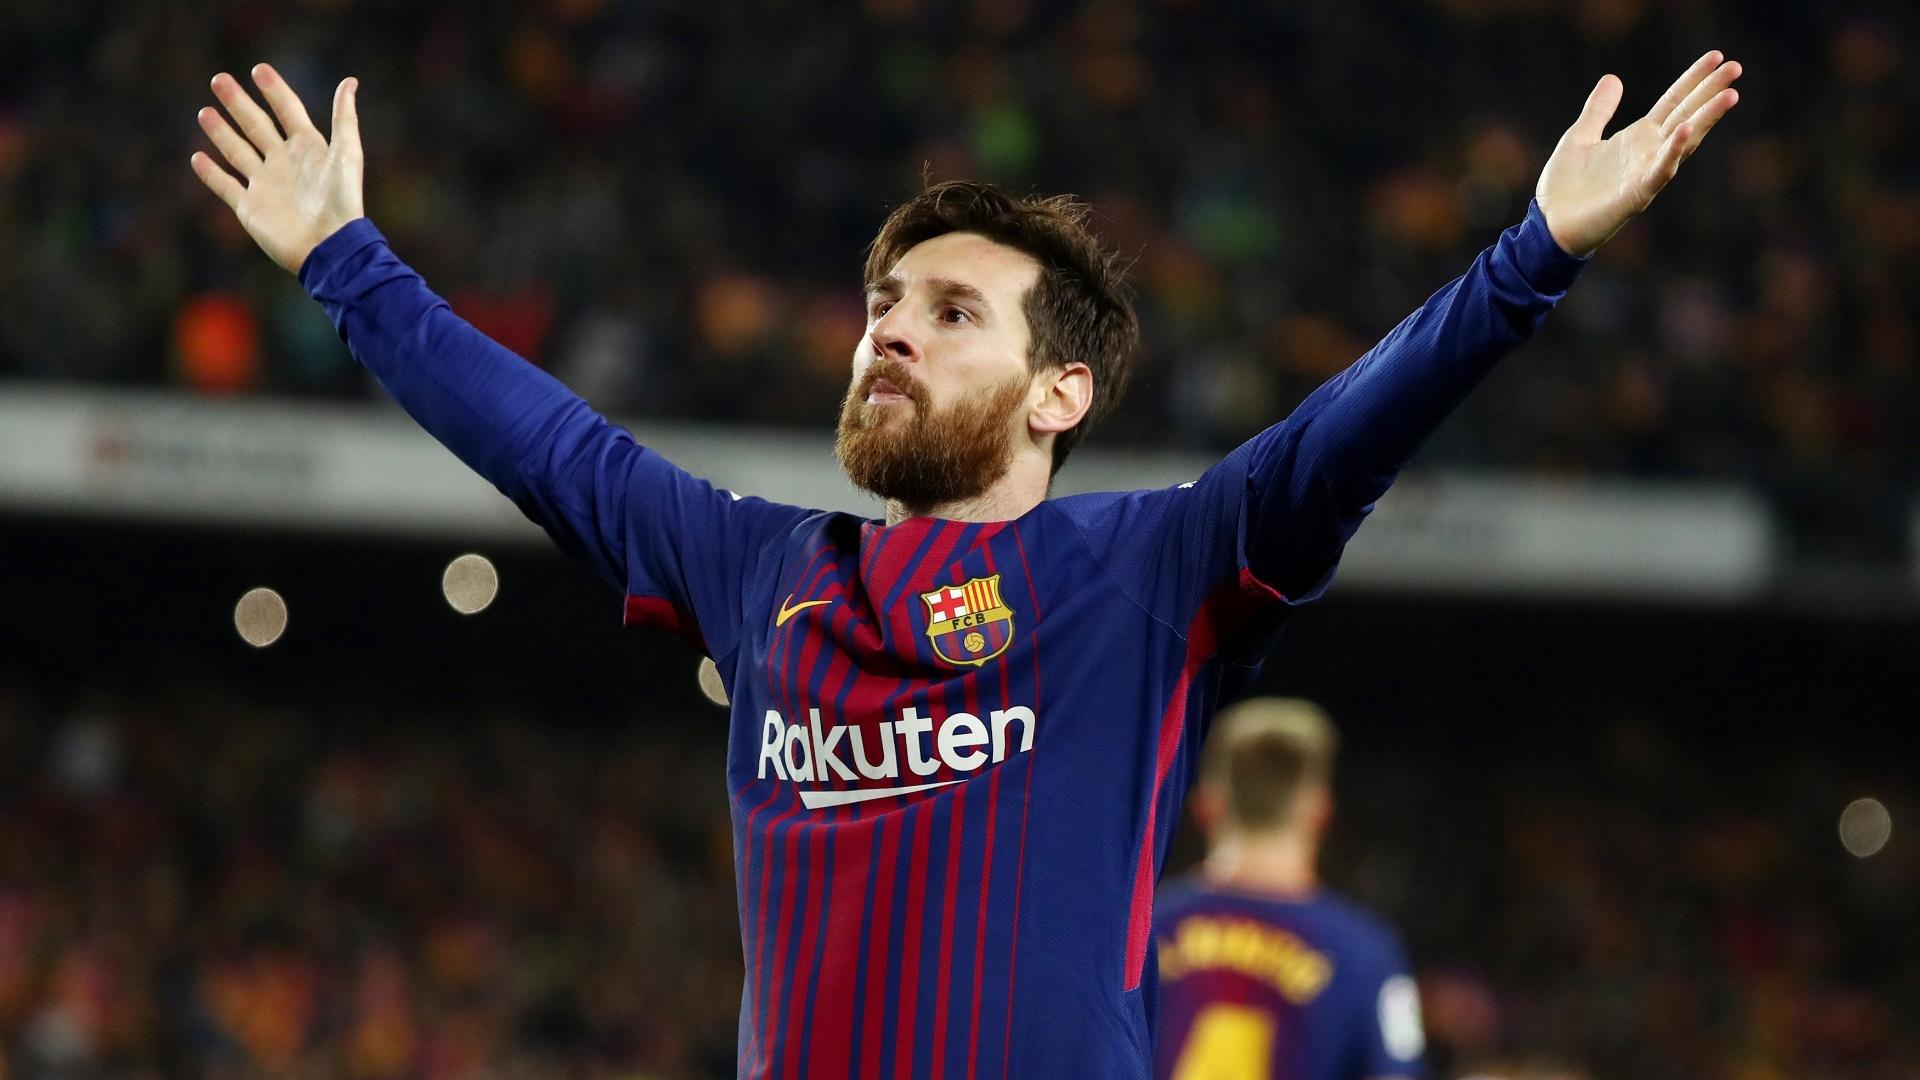 Lionel Messi comemora após marcar para o Barcelona contra o Real Madrid